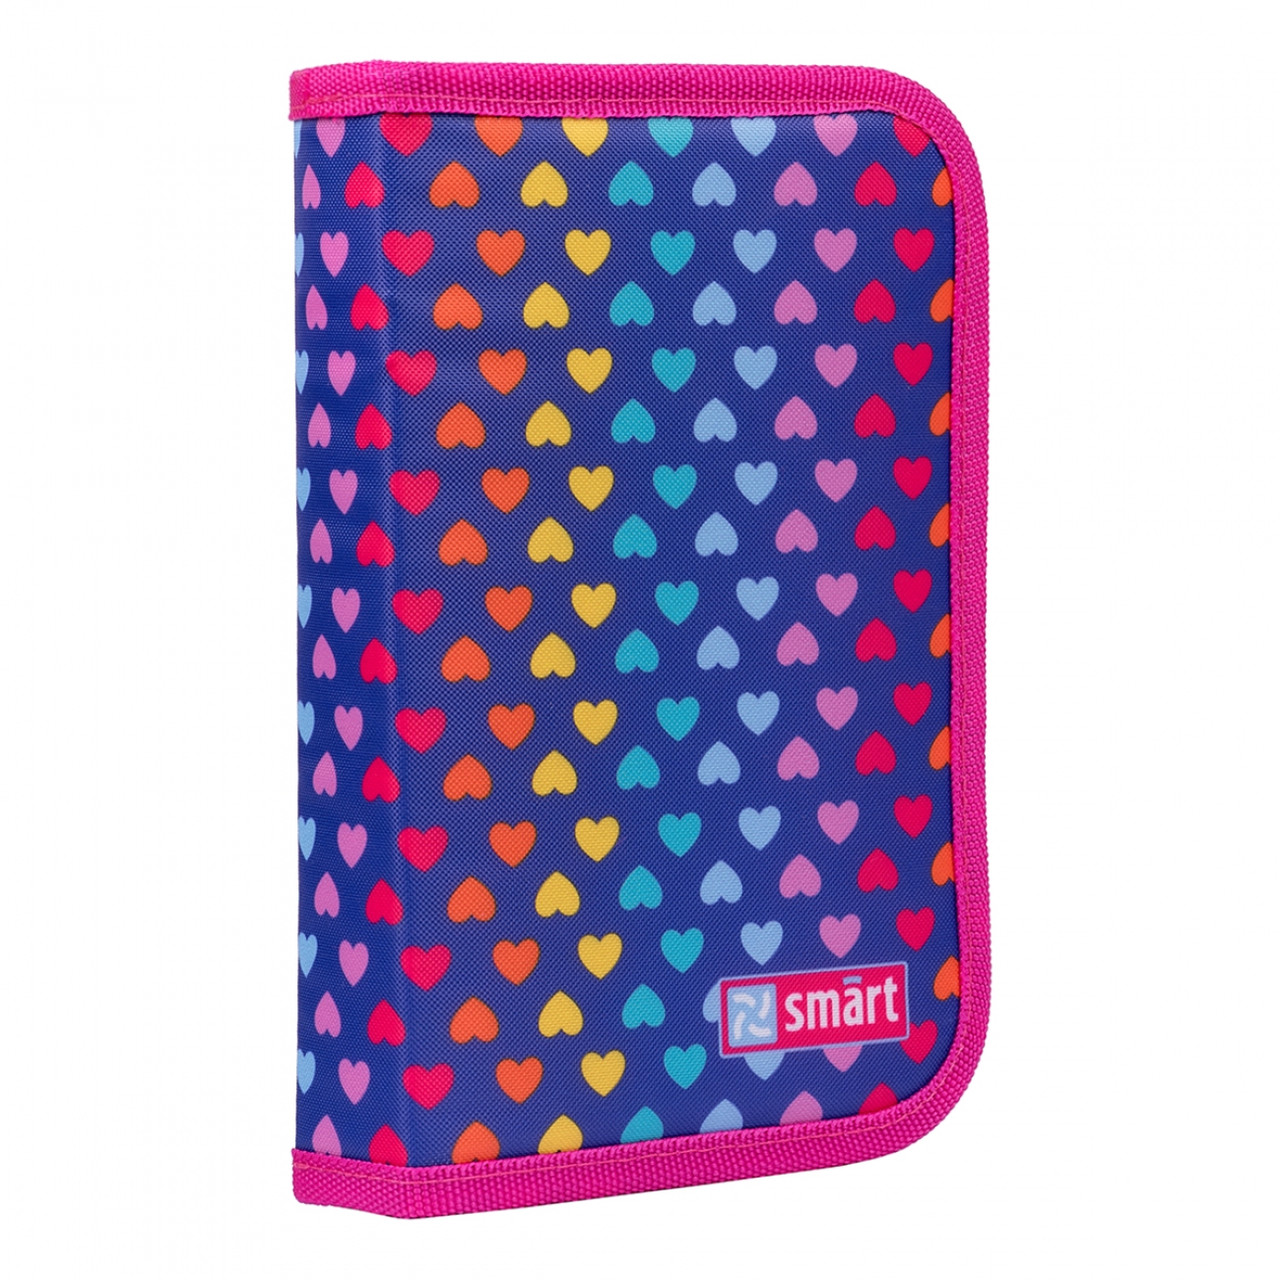 "Пенал твердий Smart оодинарный з клапаном HP-03 ""Rainbow hearts"",фіолетовий 532824"